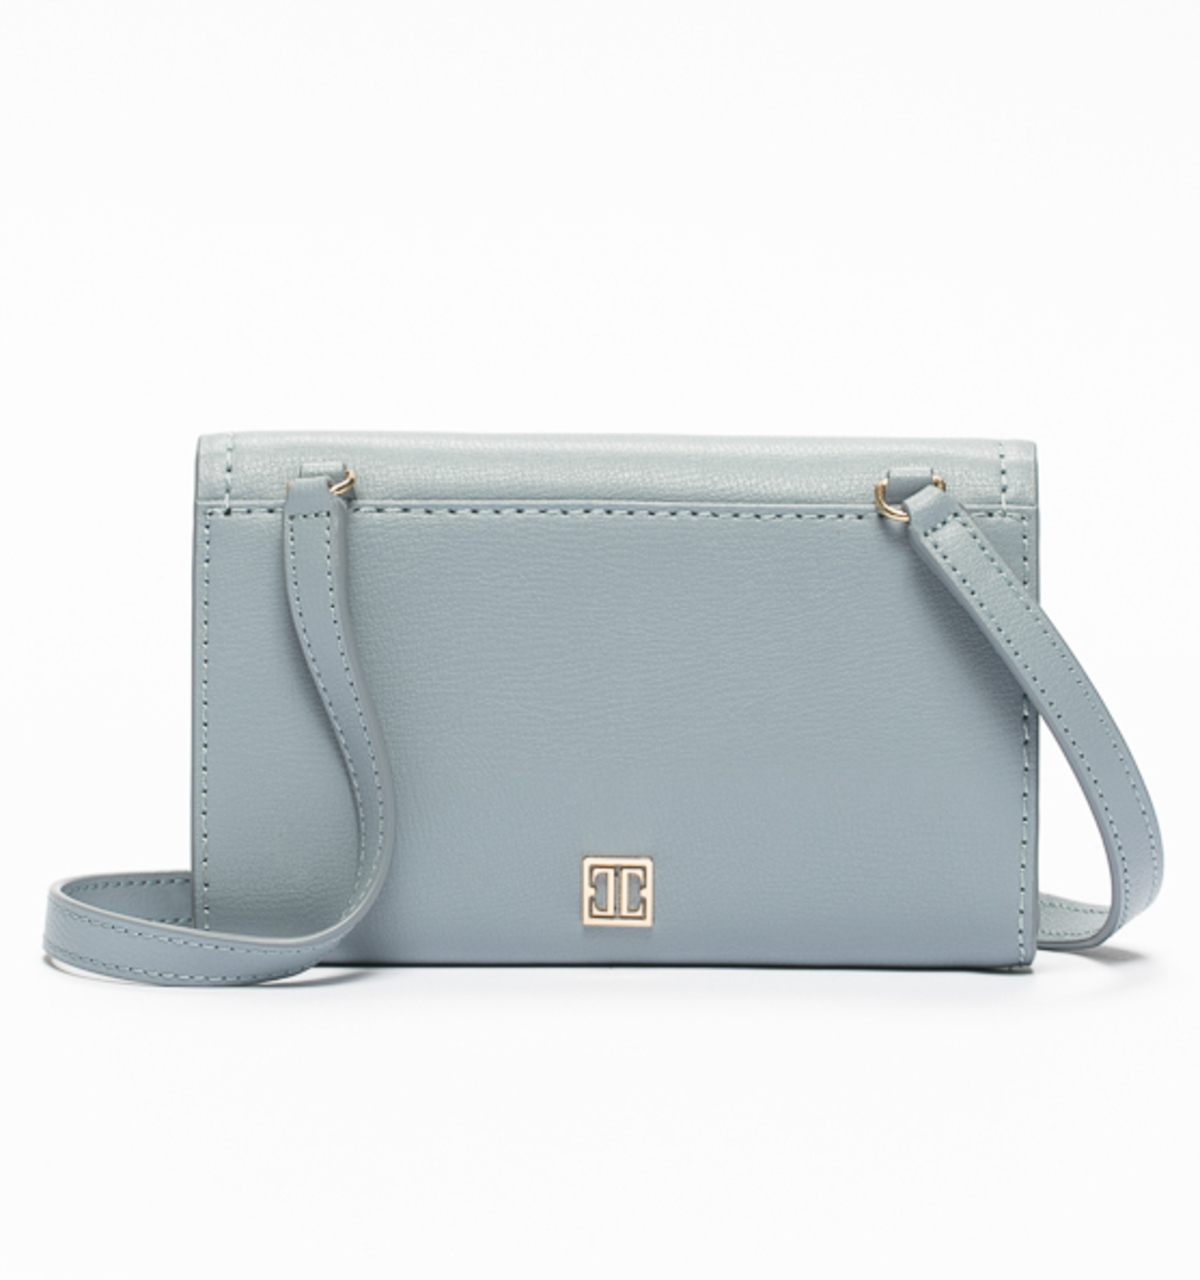 Stanton wallet crossbody arona back